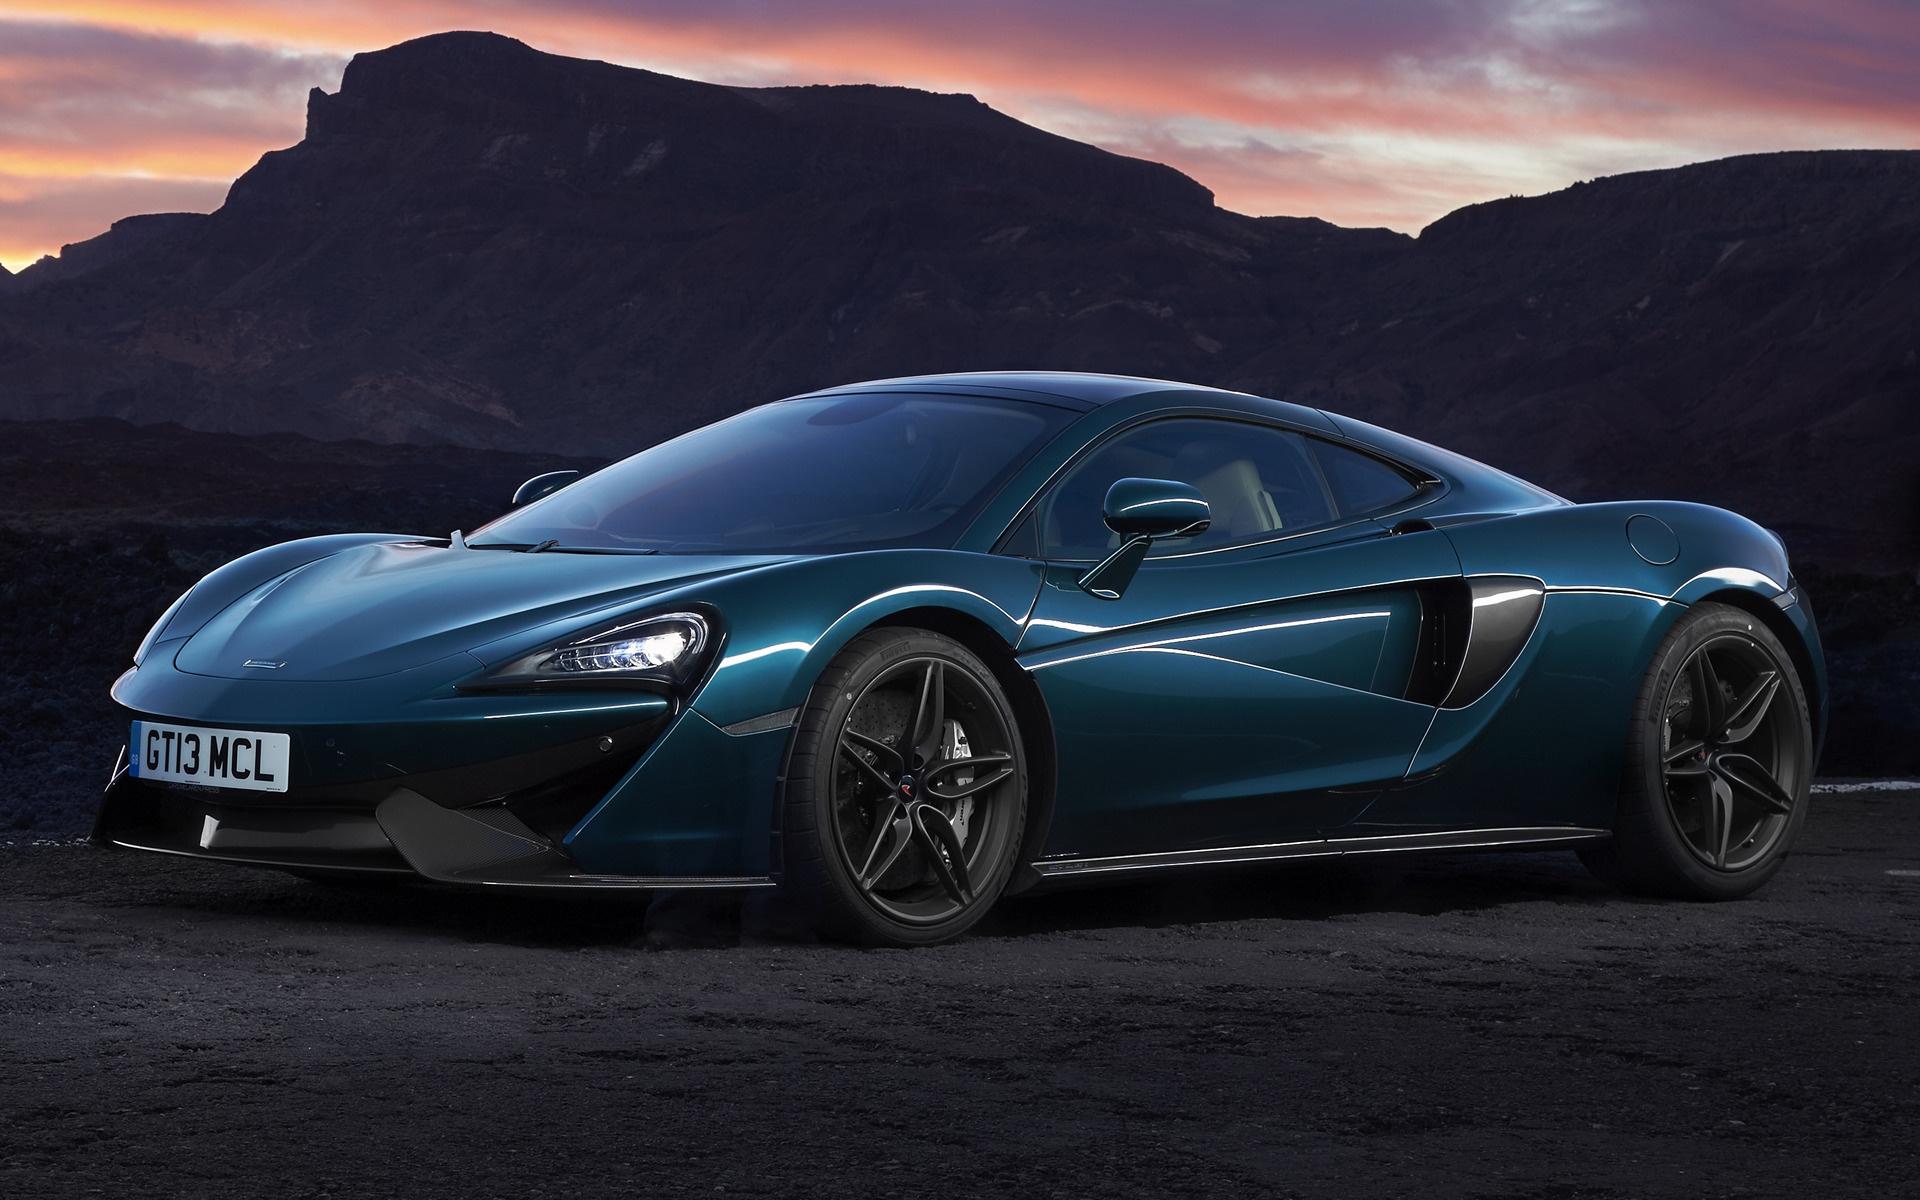 2019 Ram Hd >> McLaren 570GT (2016) Wallpapers and HD Images - Car Pixel